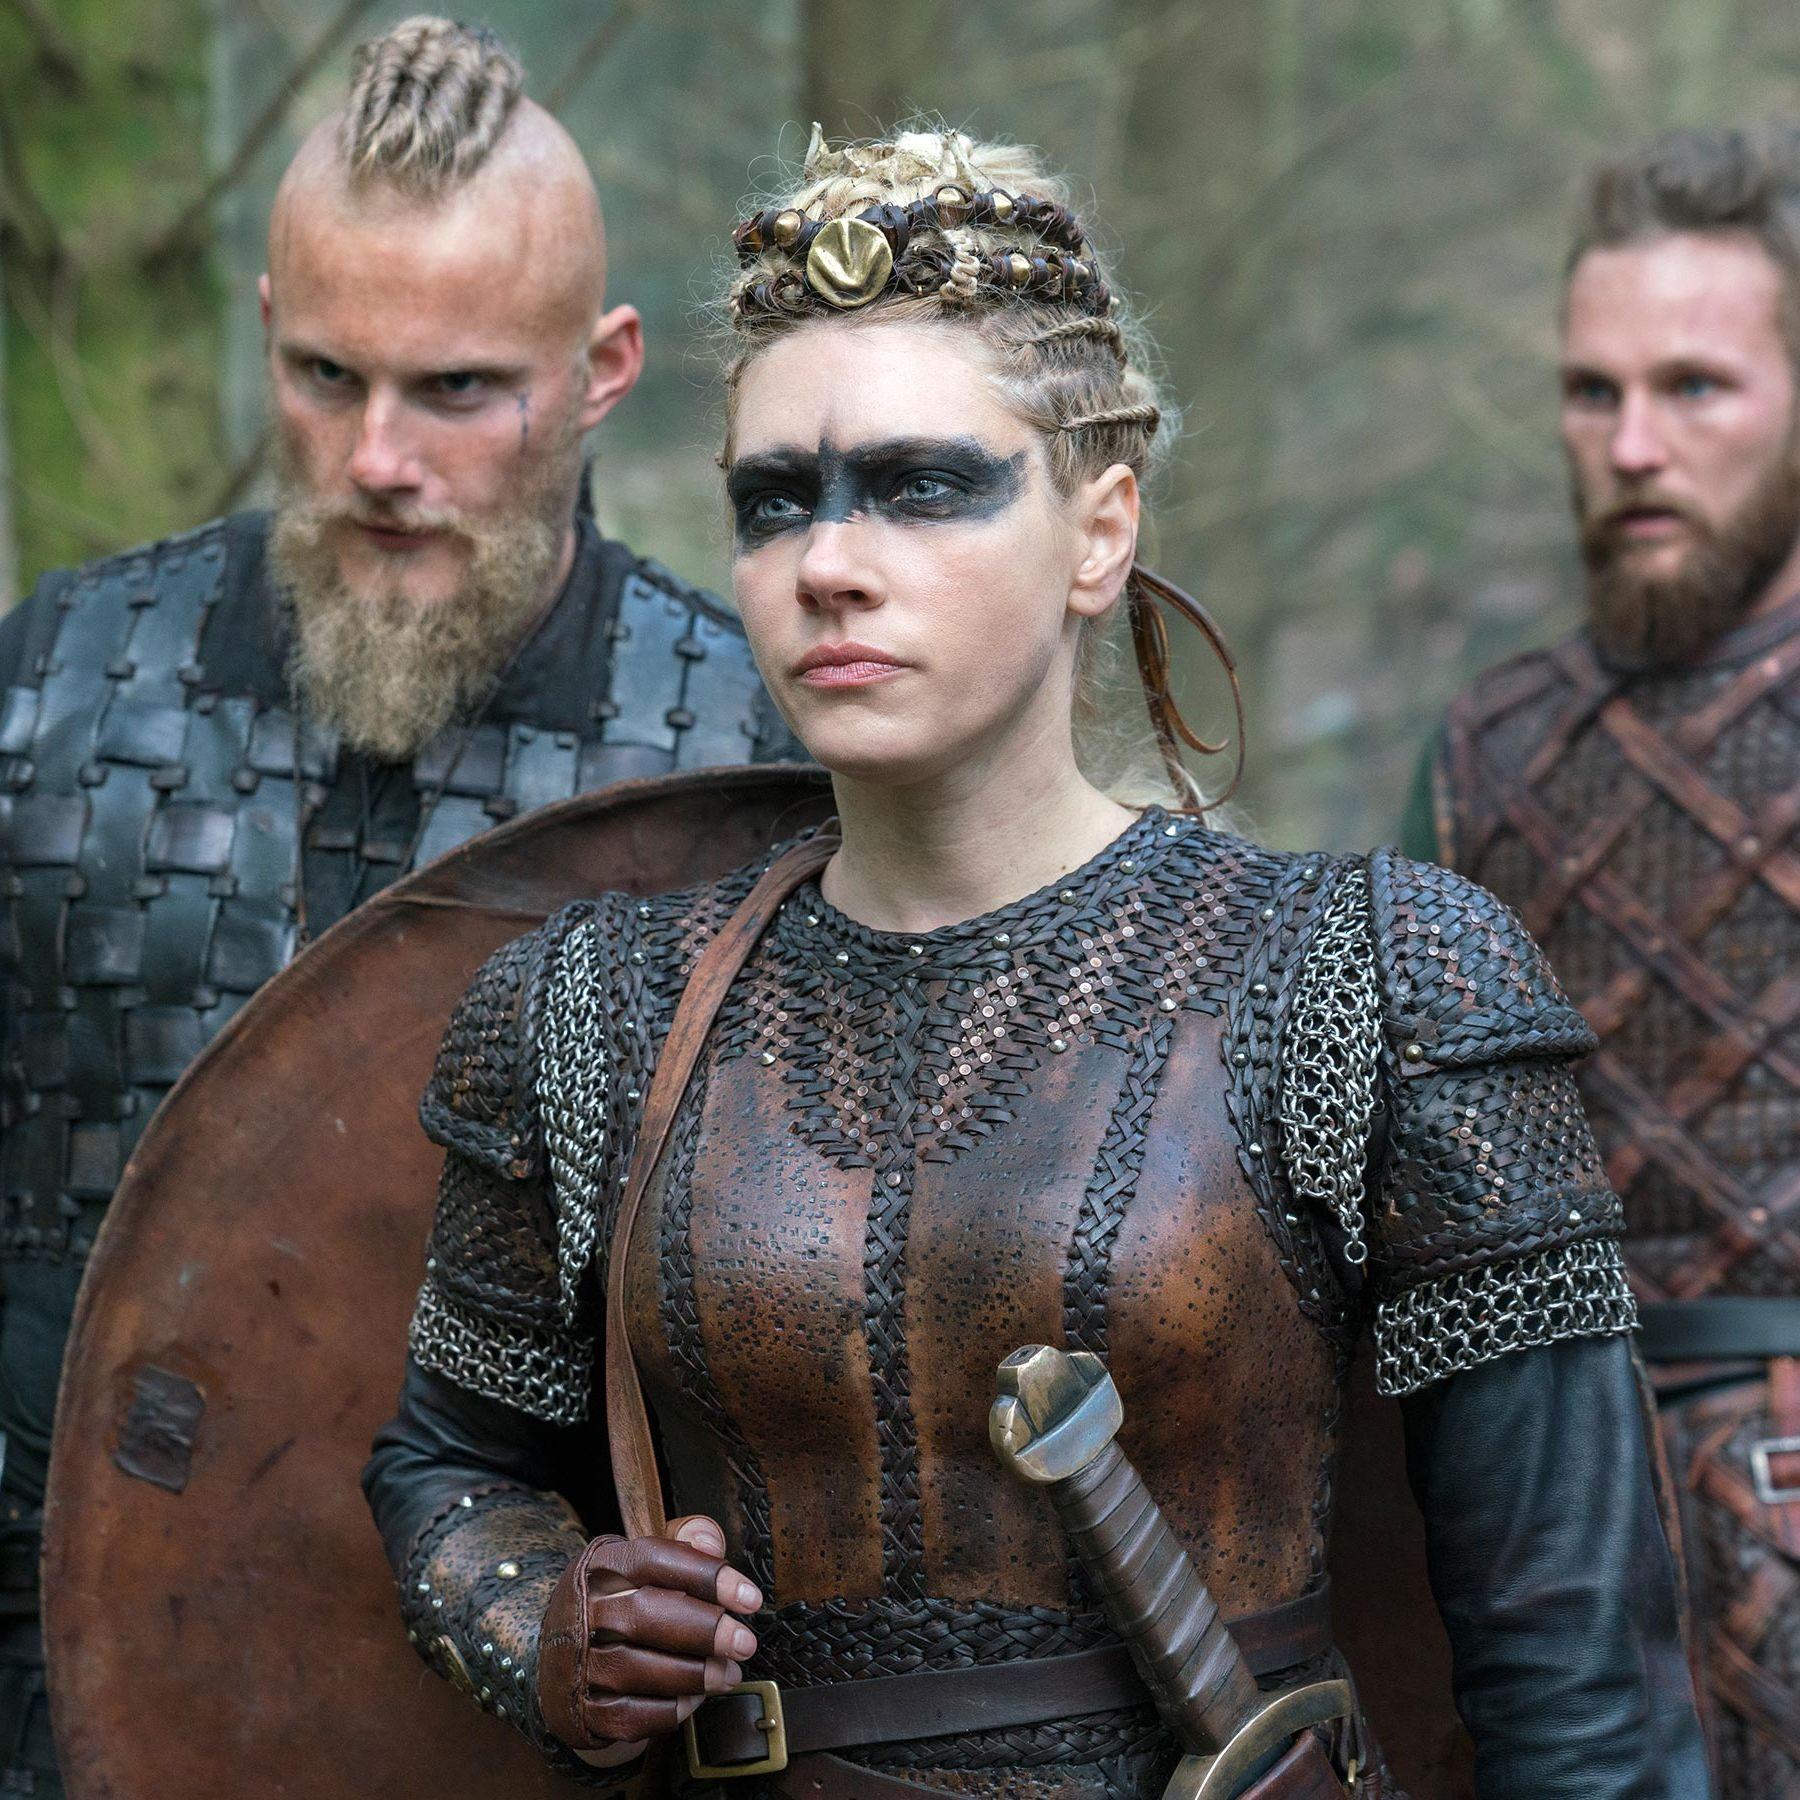 Les héroïnes badass dans les séries TV et les nains à l'écran